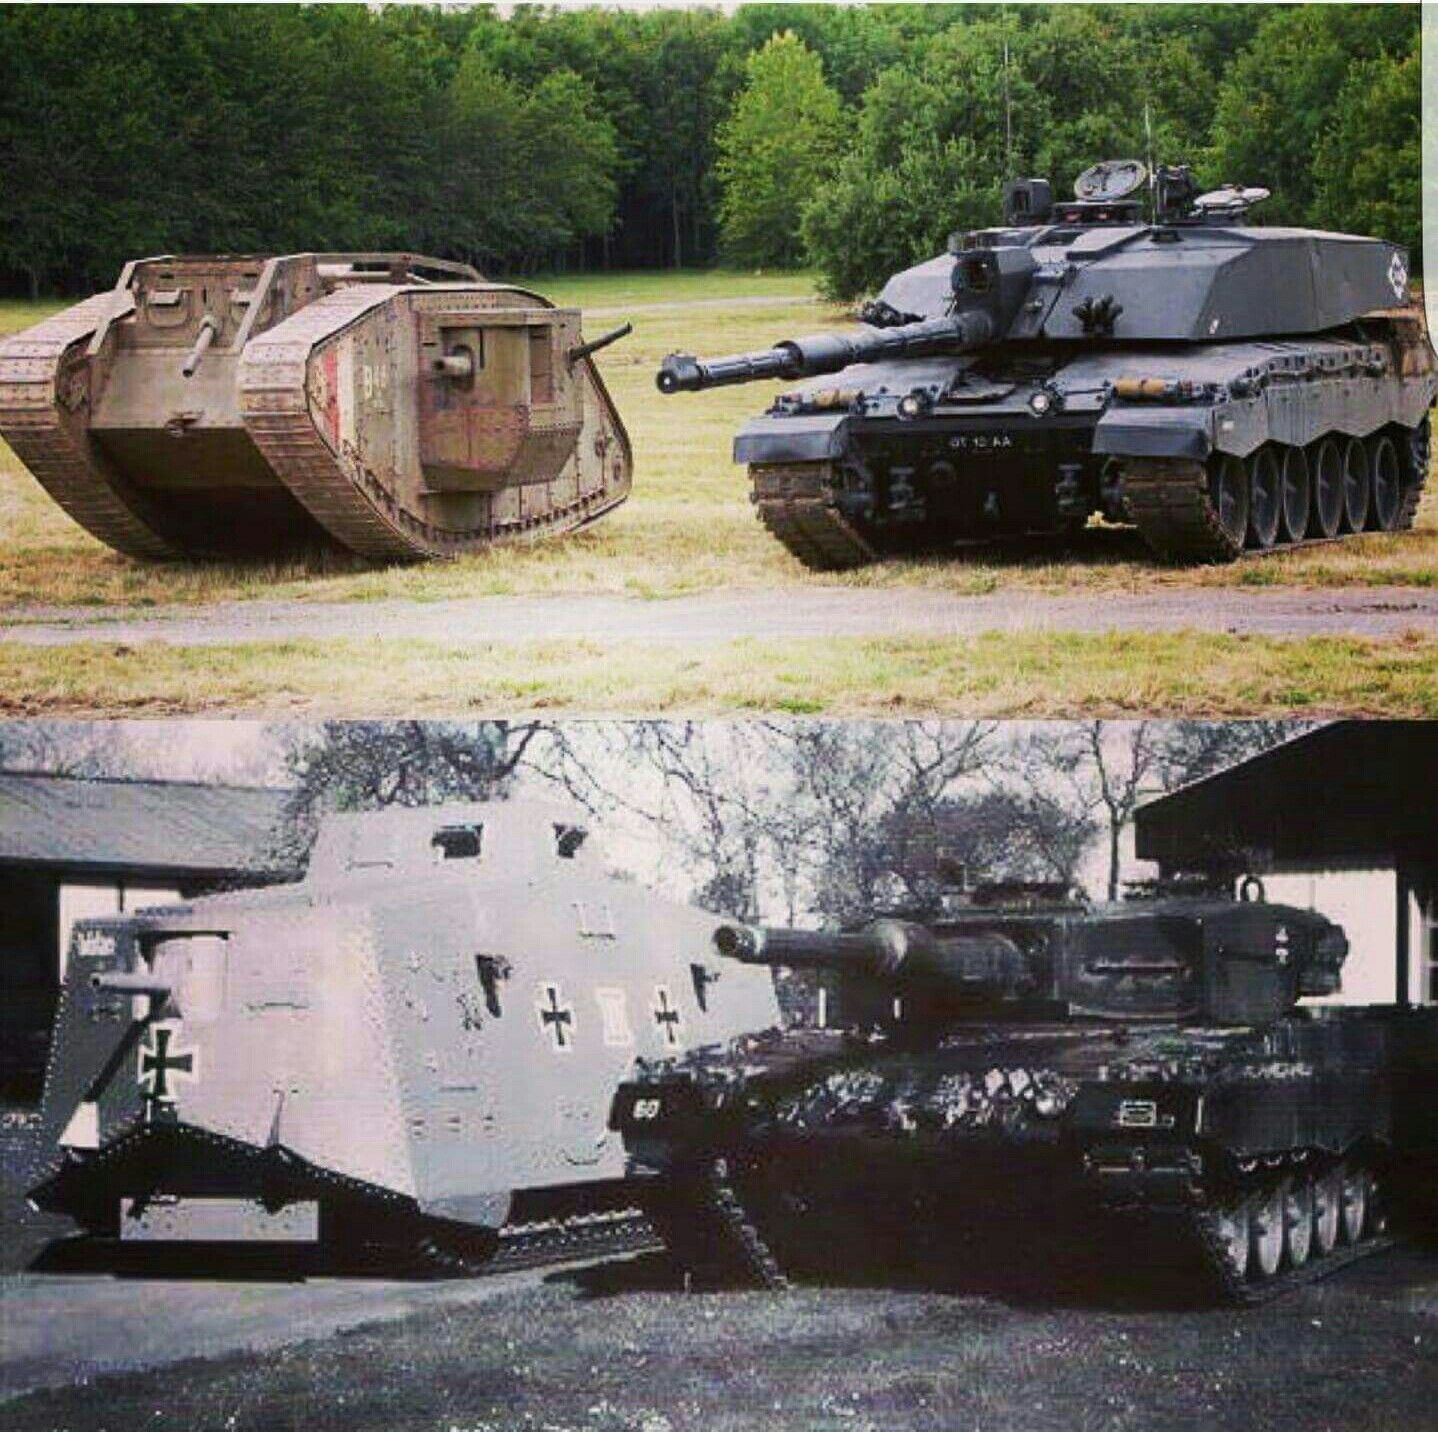 Olds And Mark Iv-challenger 2 A7v-leopard A4